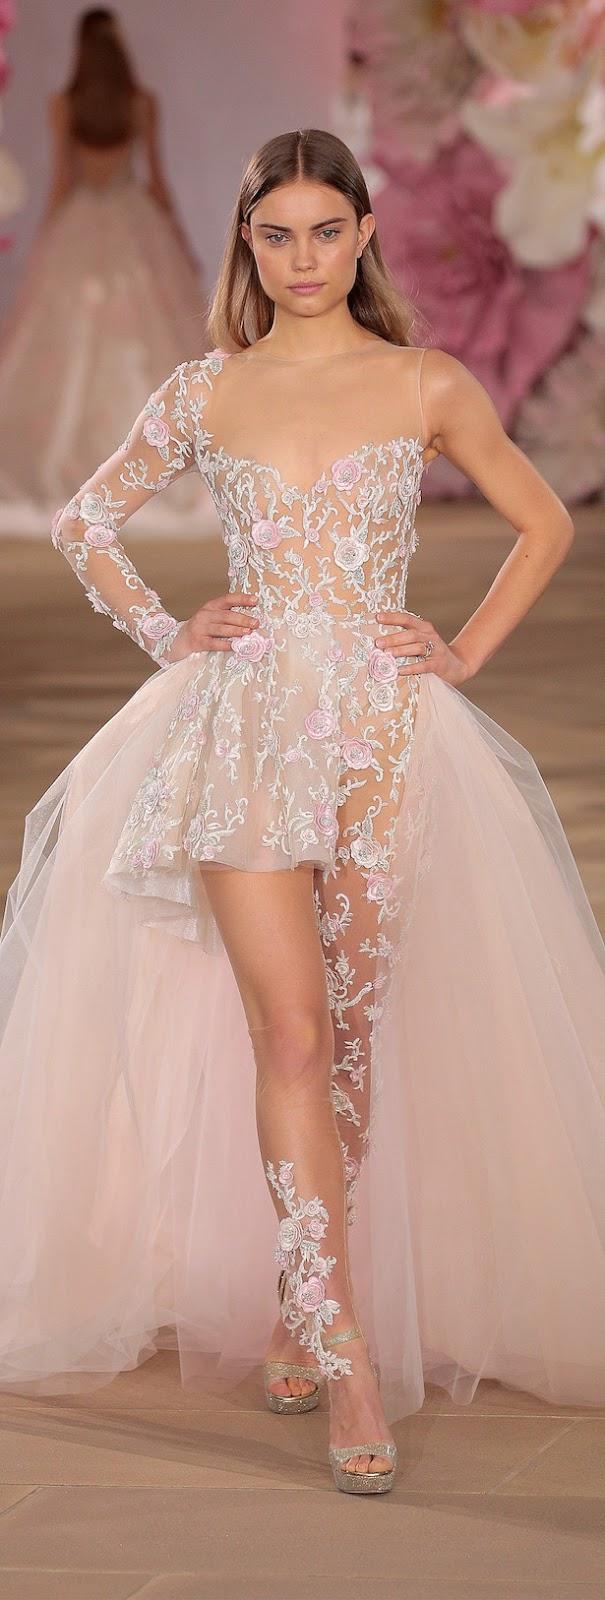 Contemporáneo Vestido De Novia Mini Falda Ideas Ornamento ...